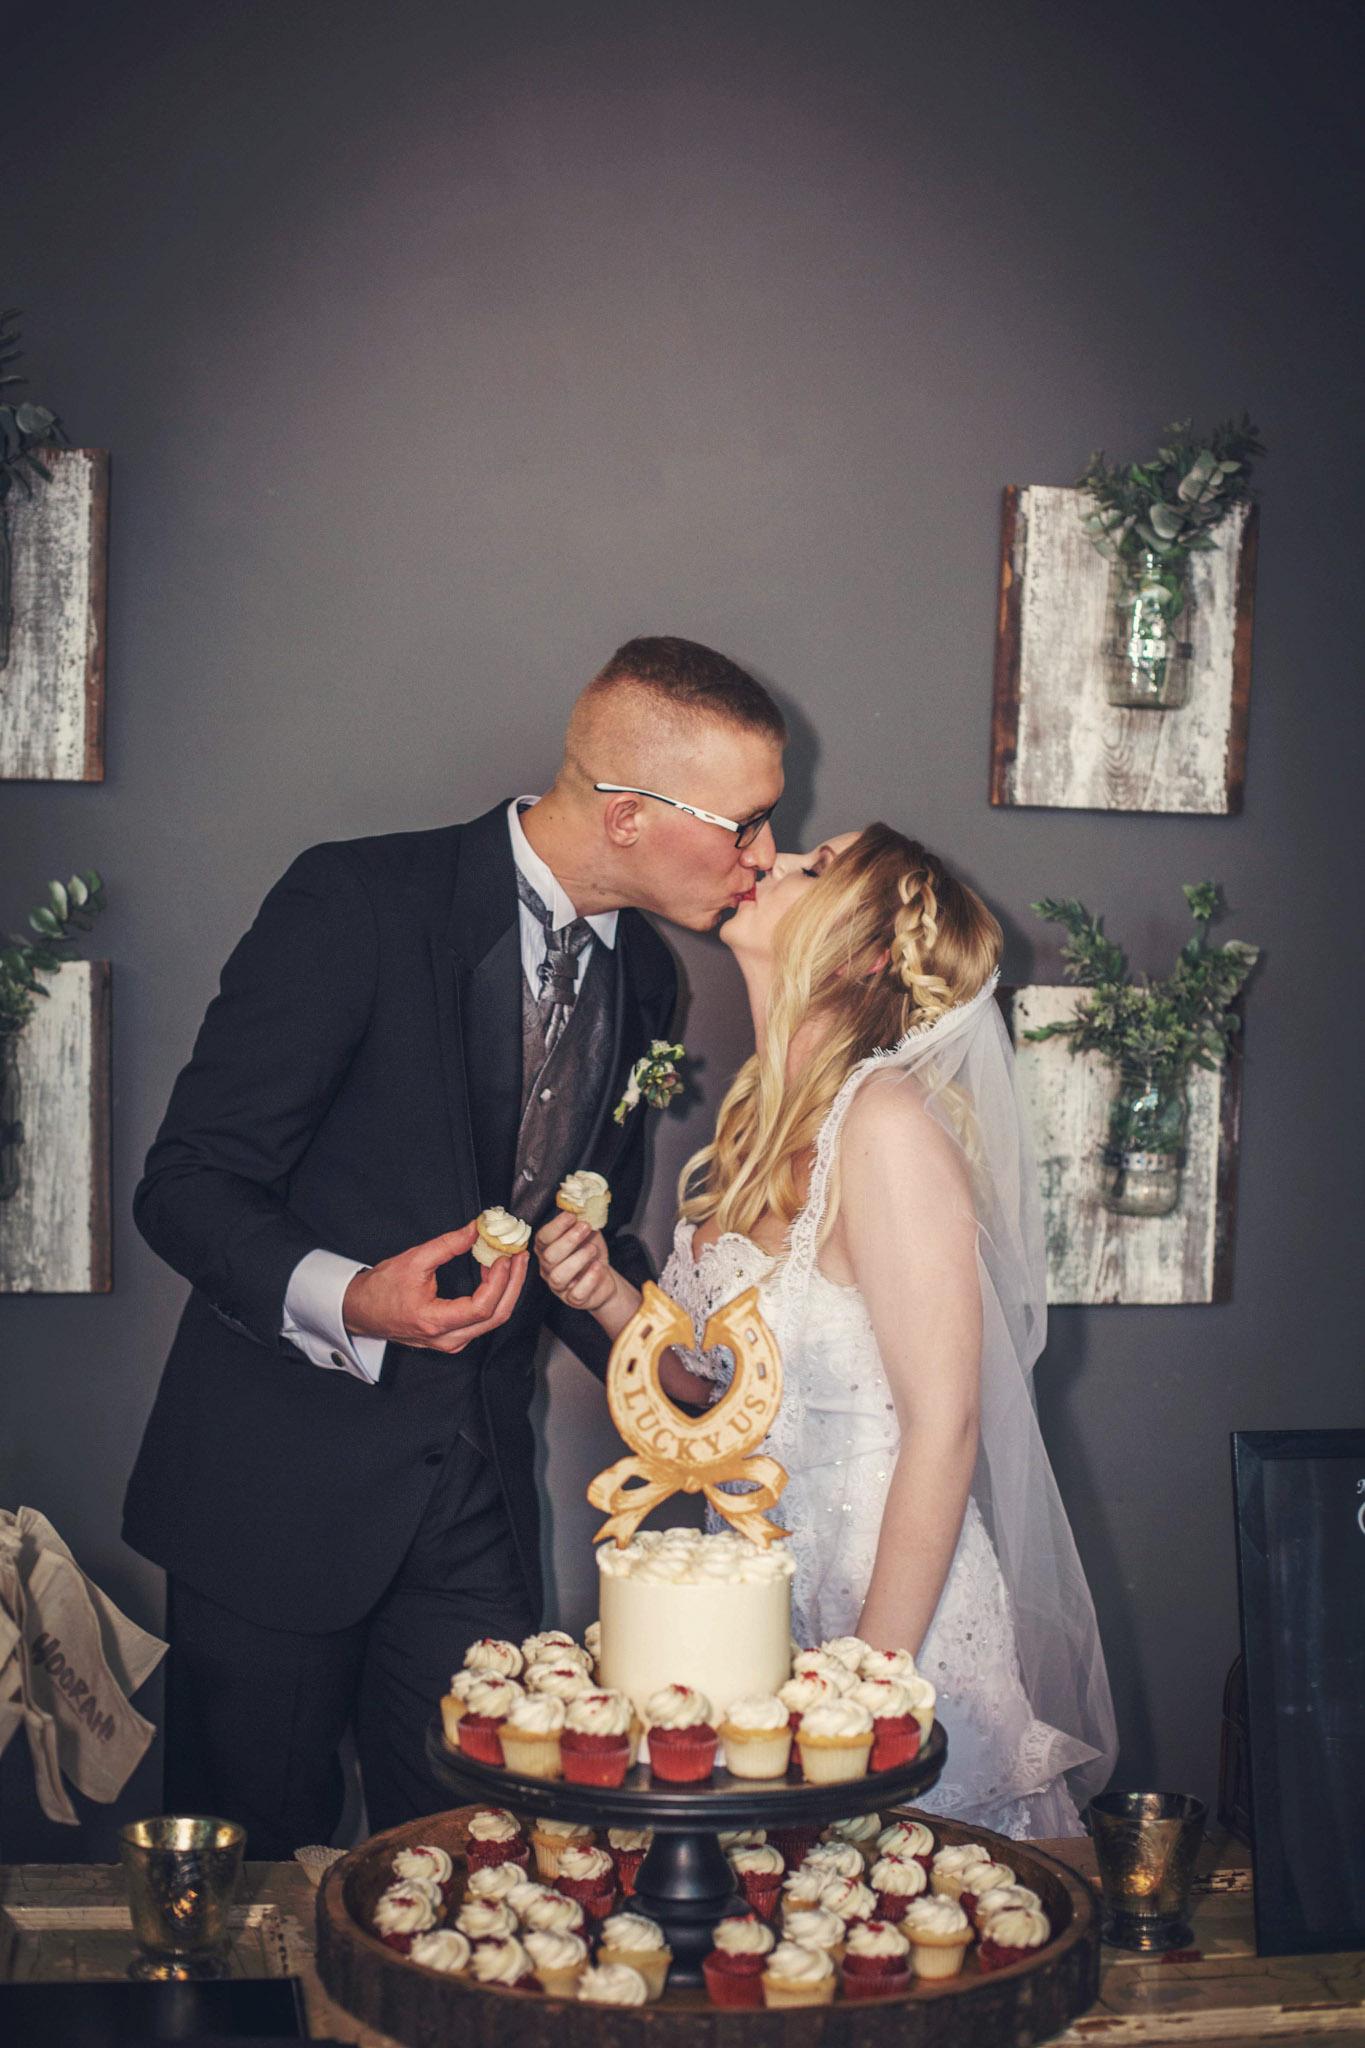 Kansas_City_Small_Intimate_Budget_Wedding_Venue_Maranda&Neal-057b.jpg